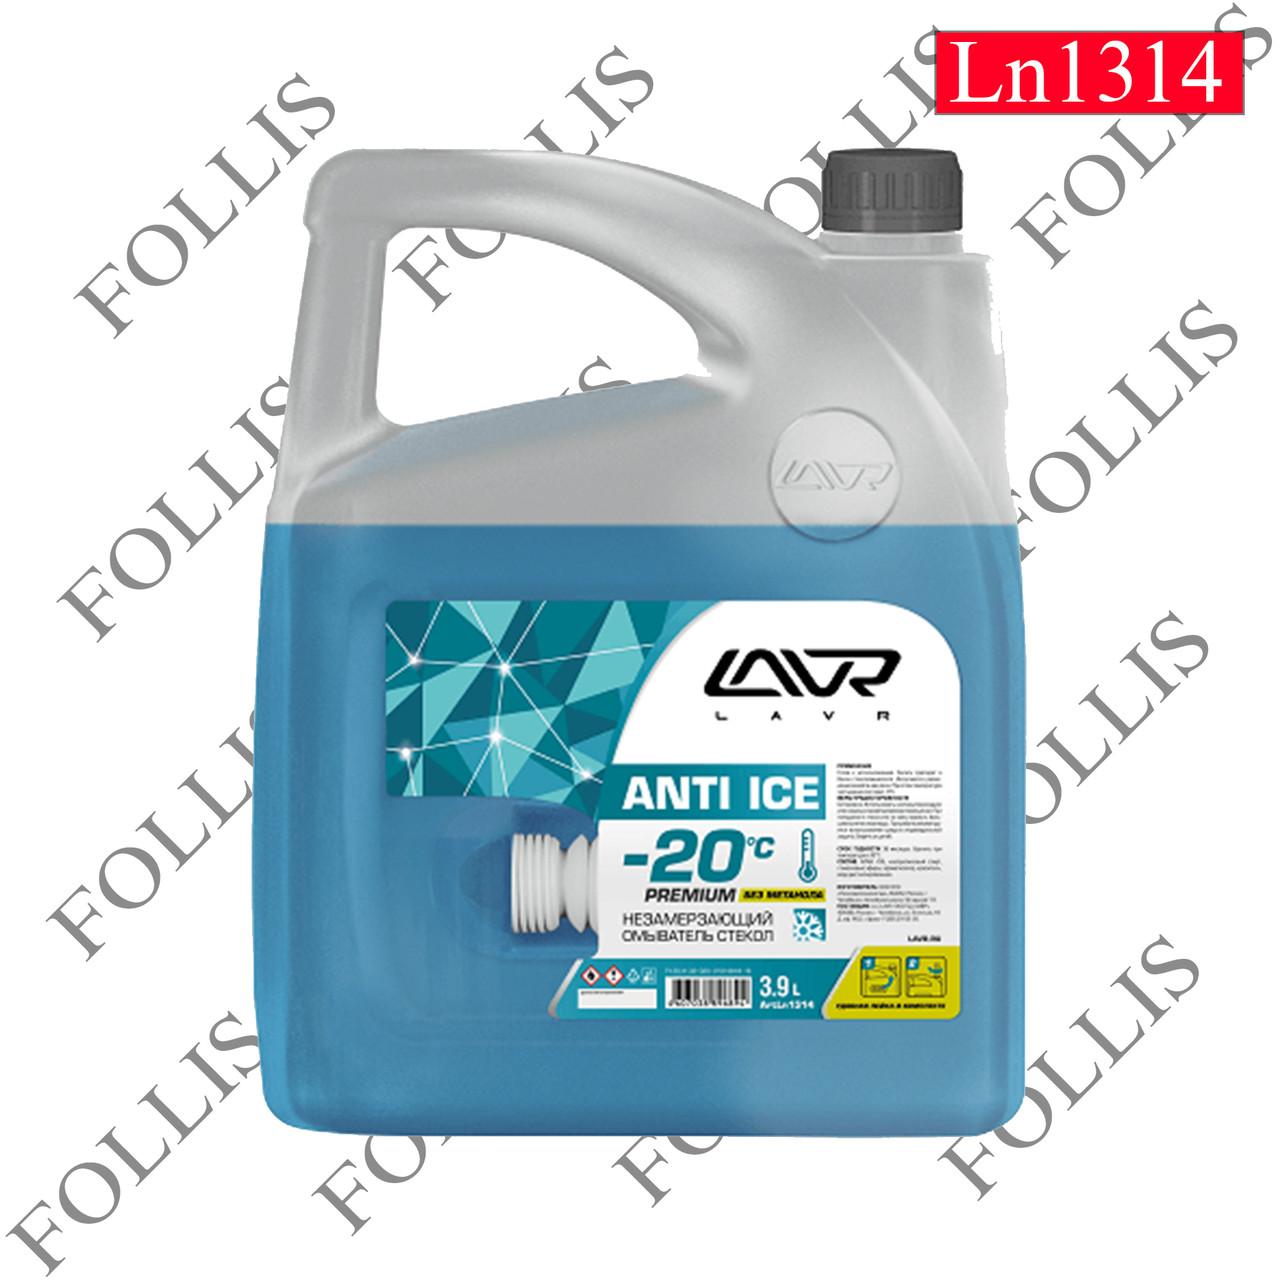 Незамерзающий омыватель стекол -20°С LAVR Anti-ice Premium 3,9 л